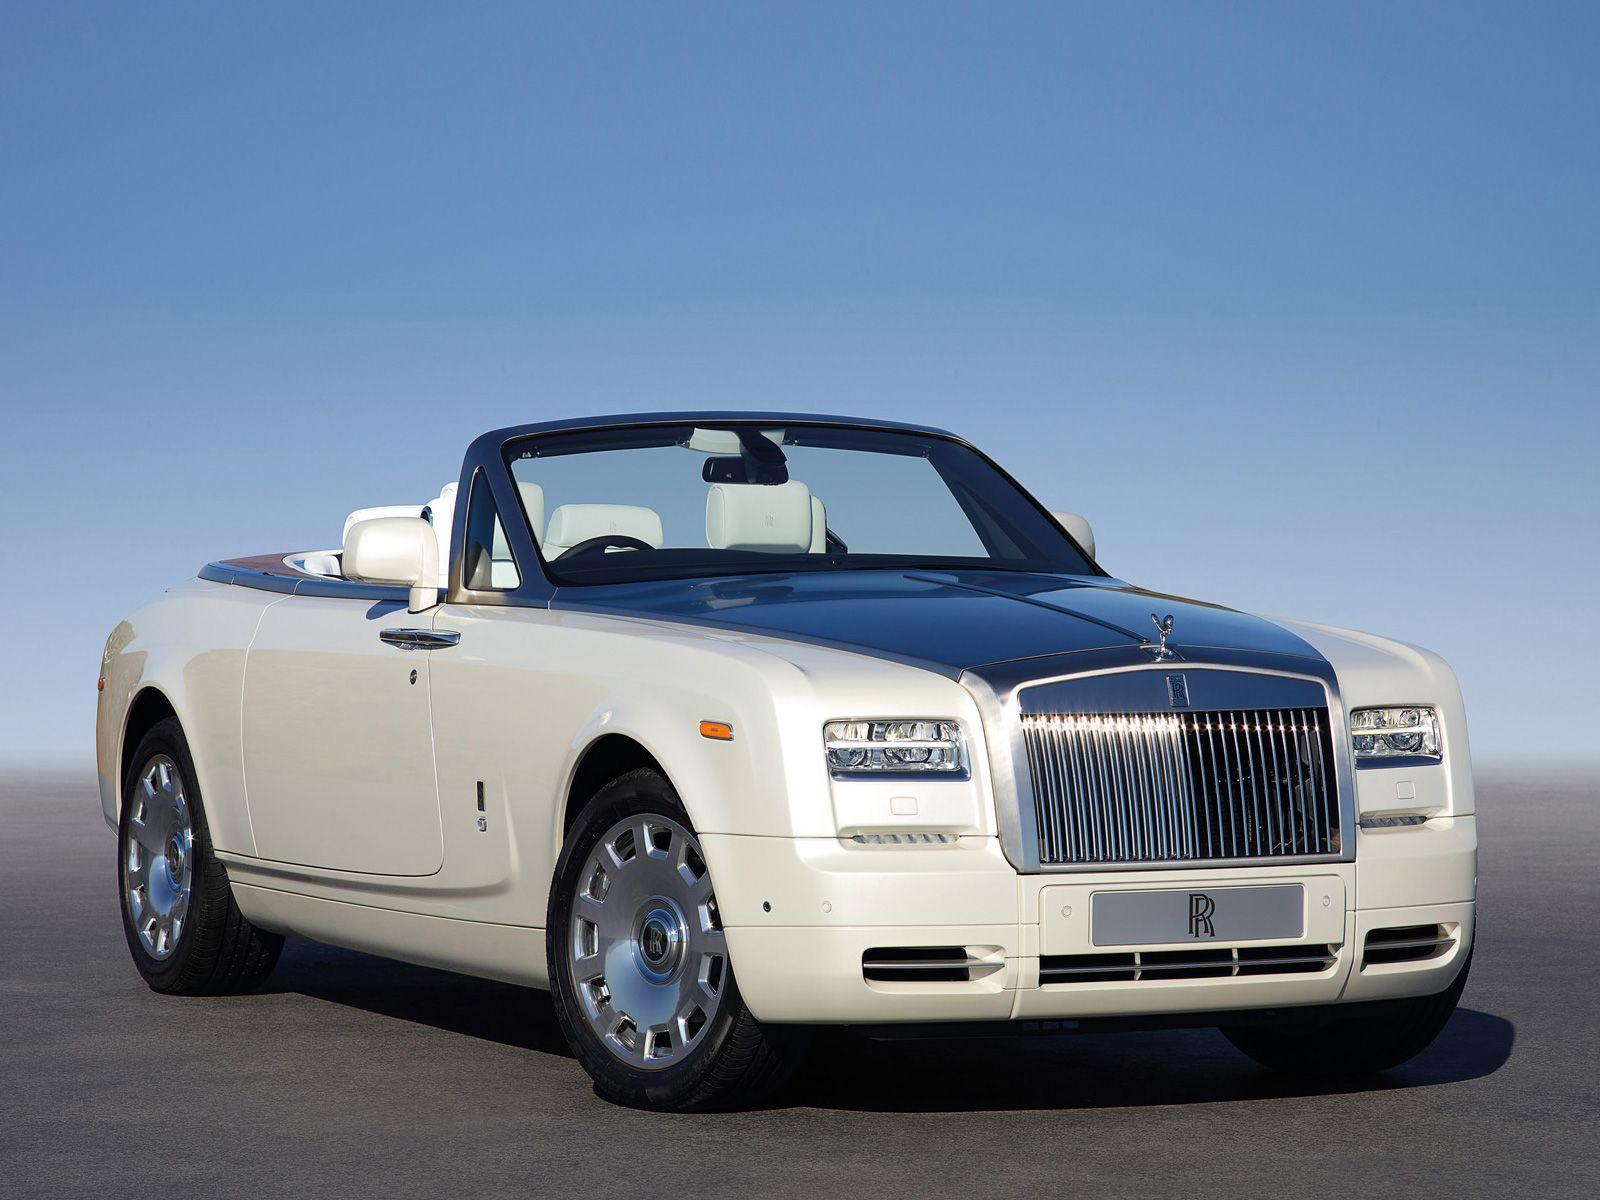 2012-Rolls-Royce-Phantom-Drophead-Coupe-Series-II-Front-Angle